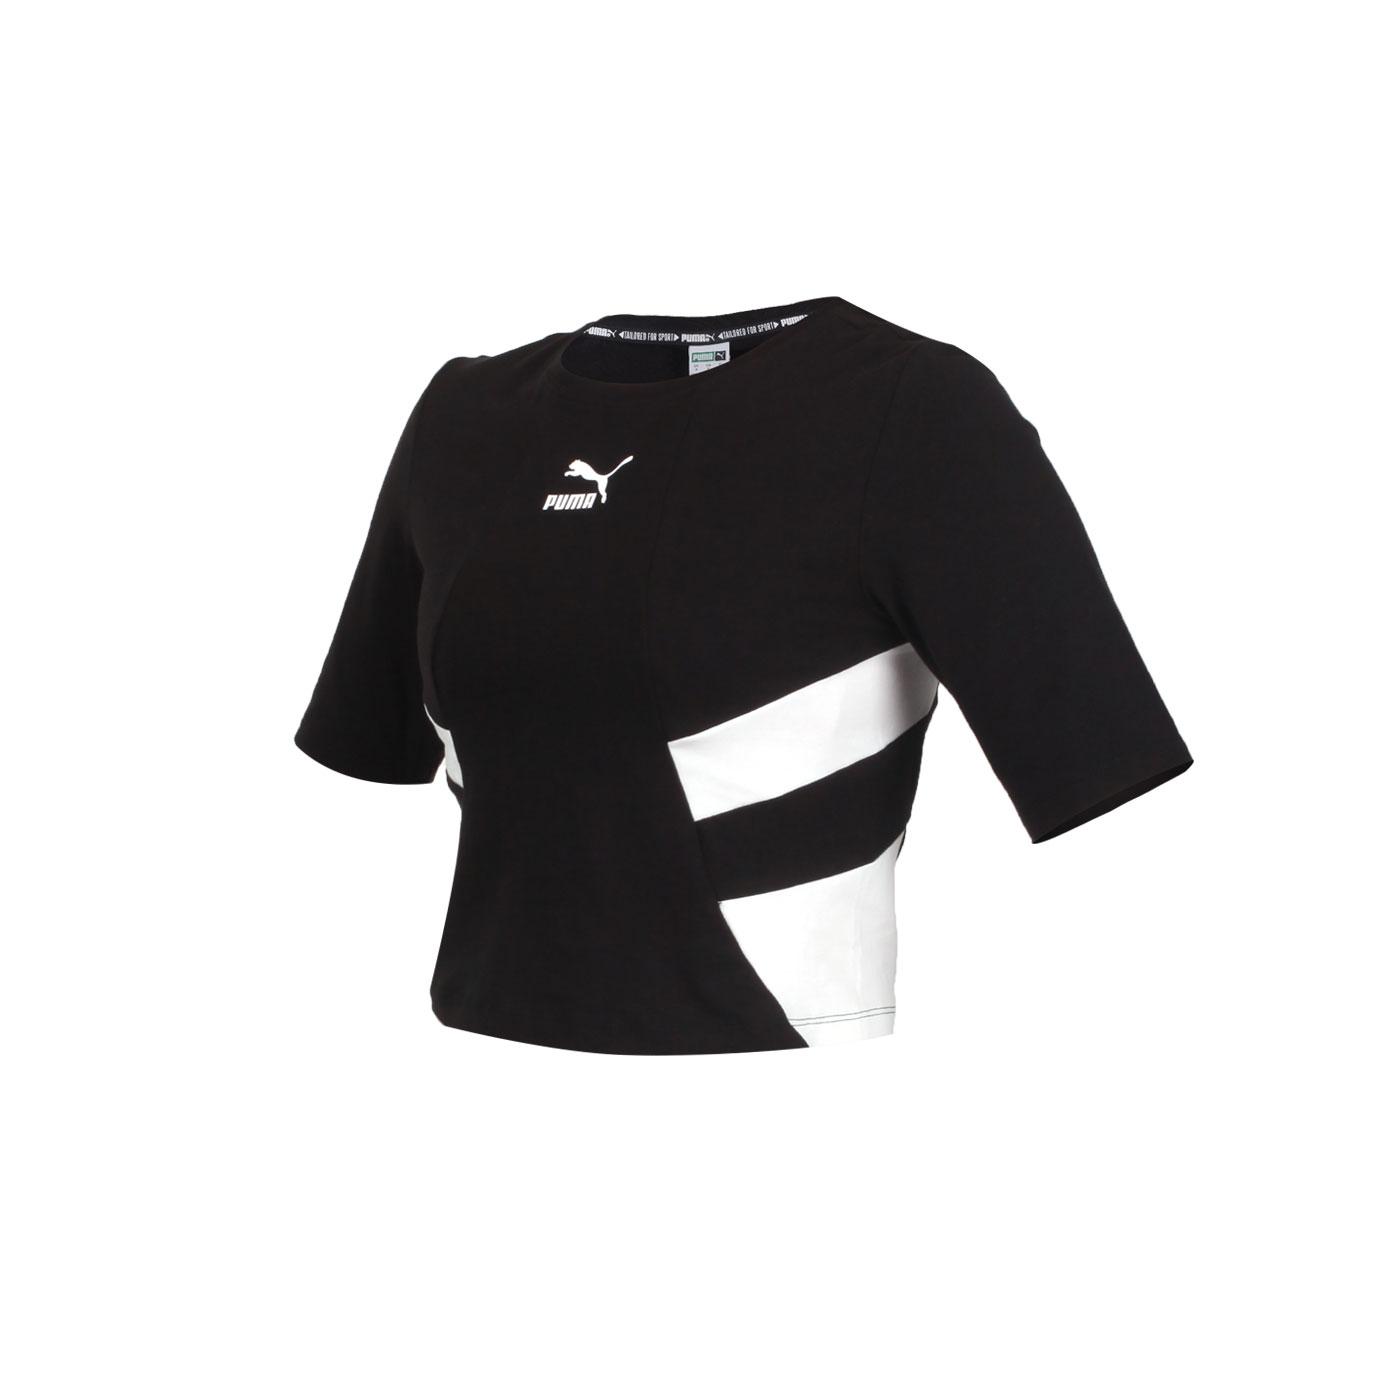 PUMA 女款流行系列TFS短版短袖T恤 59775001